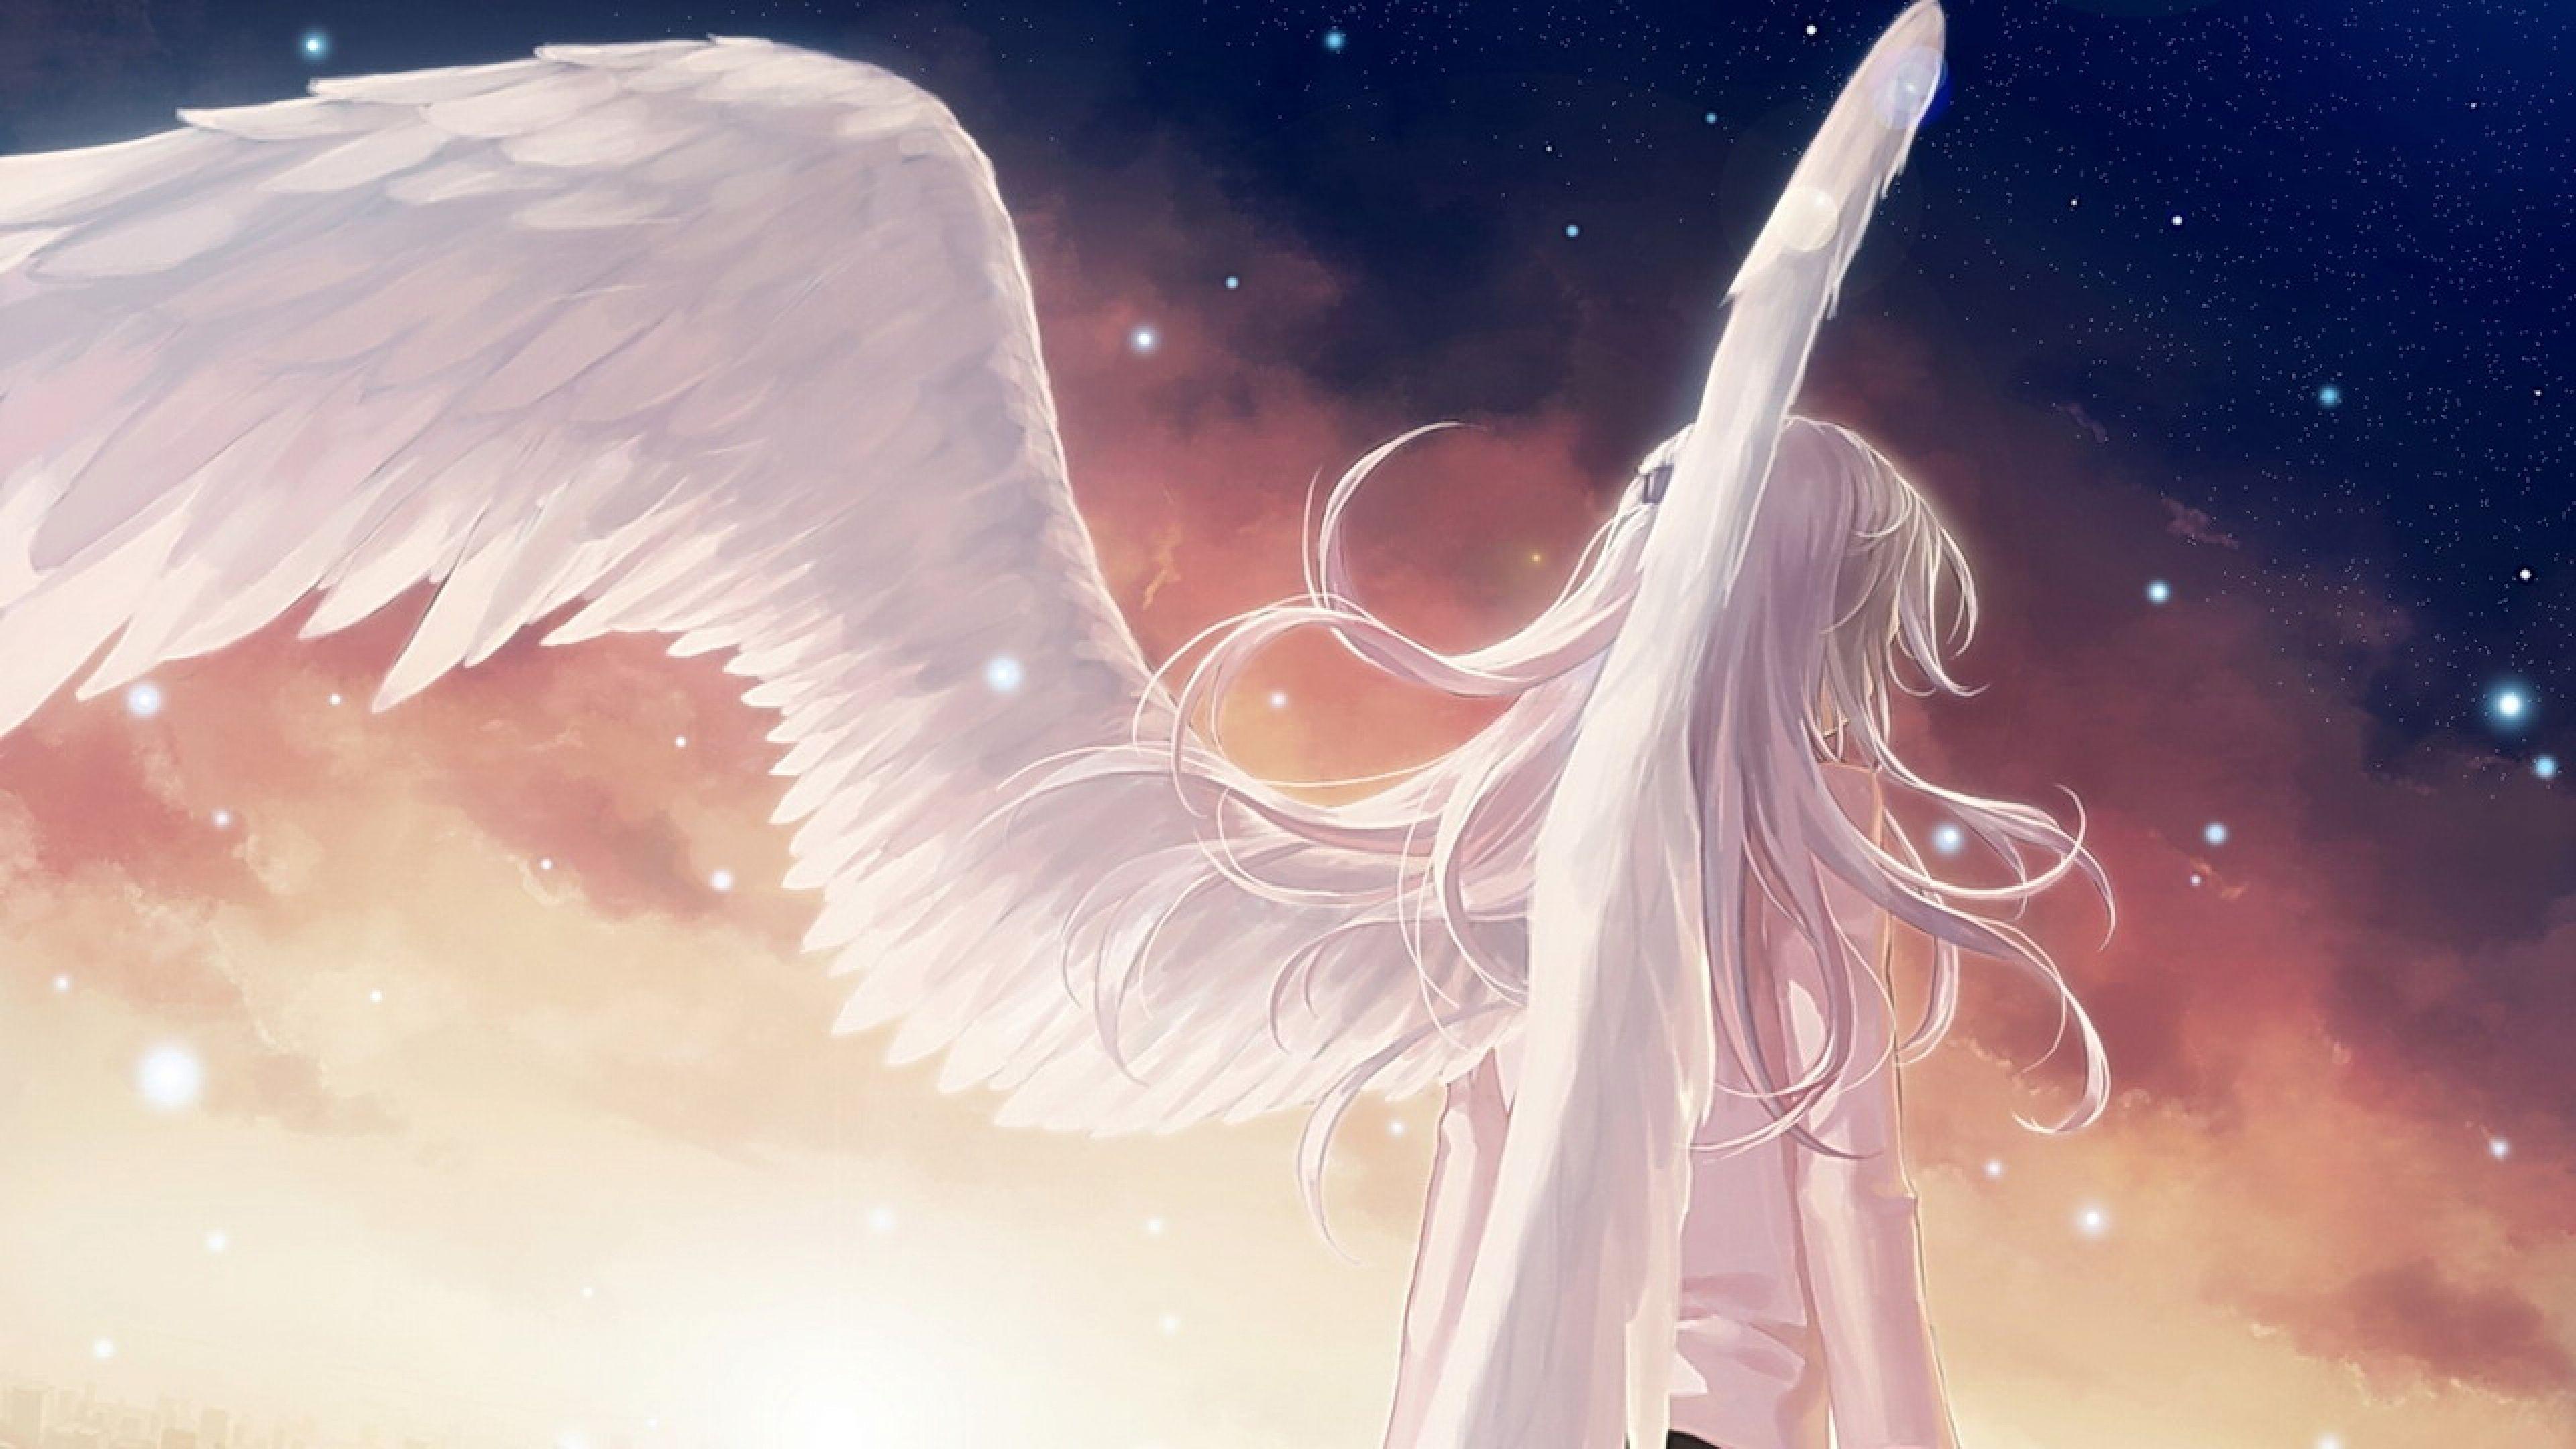 Download wallpaper 3840x2160 angel beats girl wings - Angel girl wallpaper ...